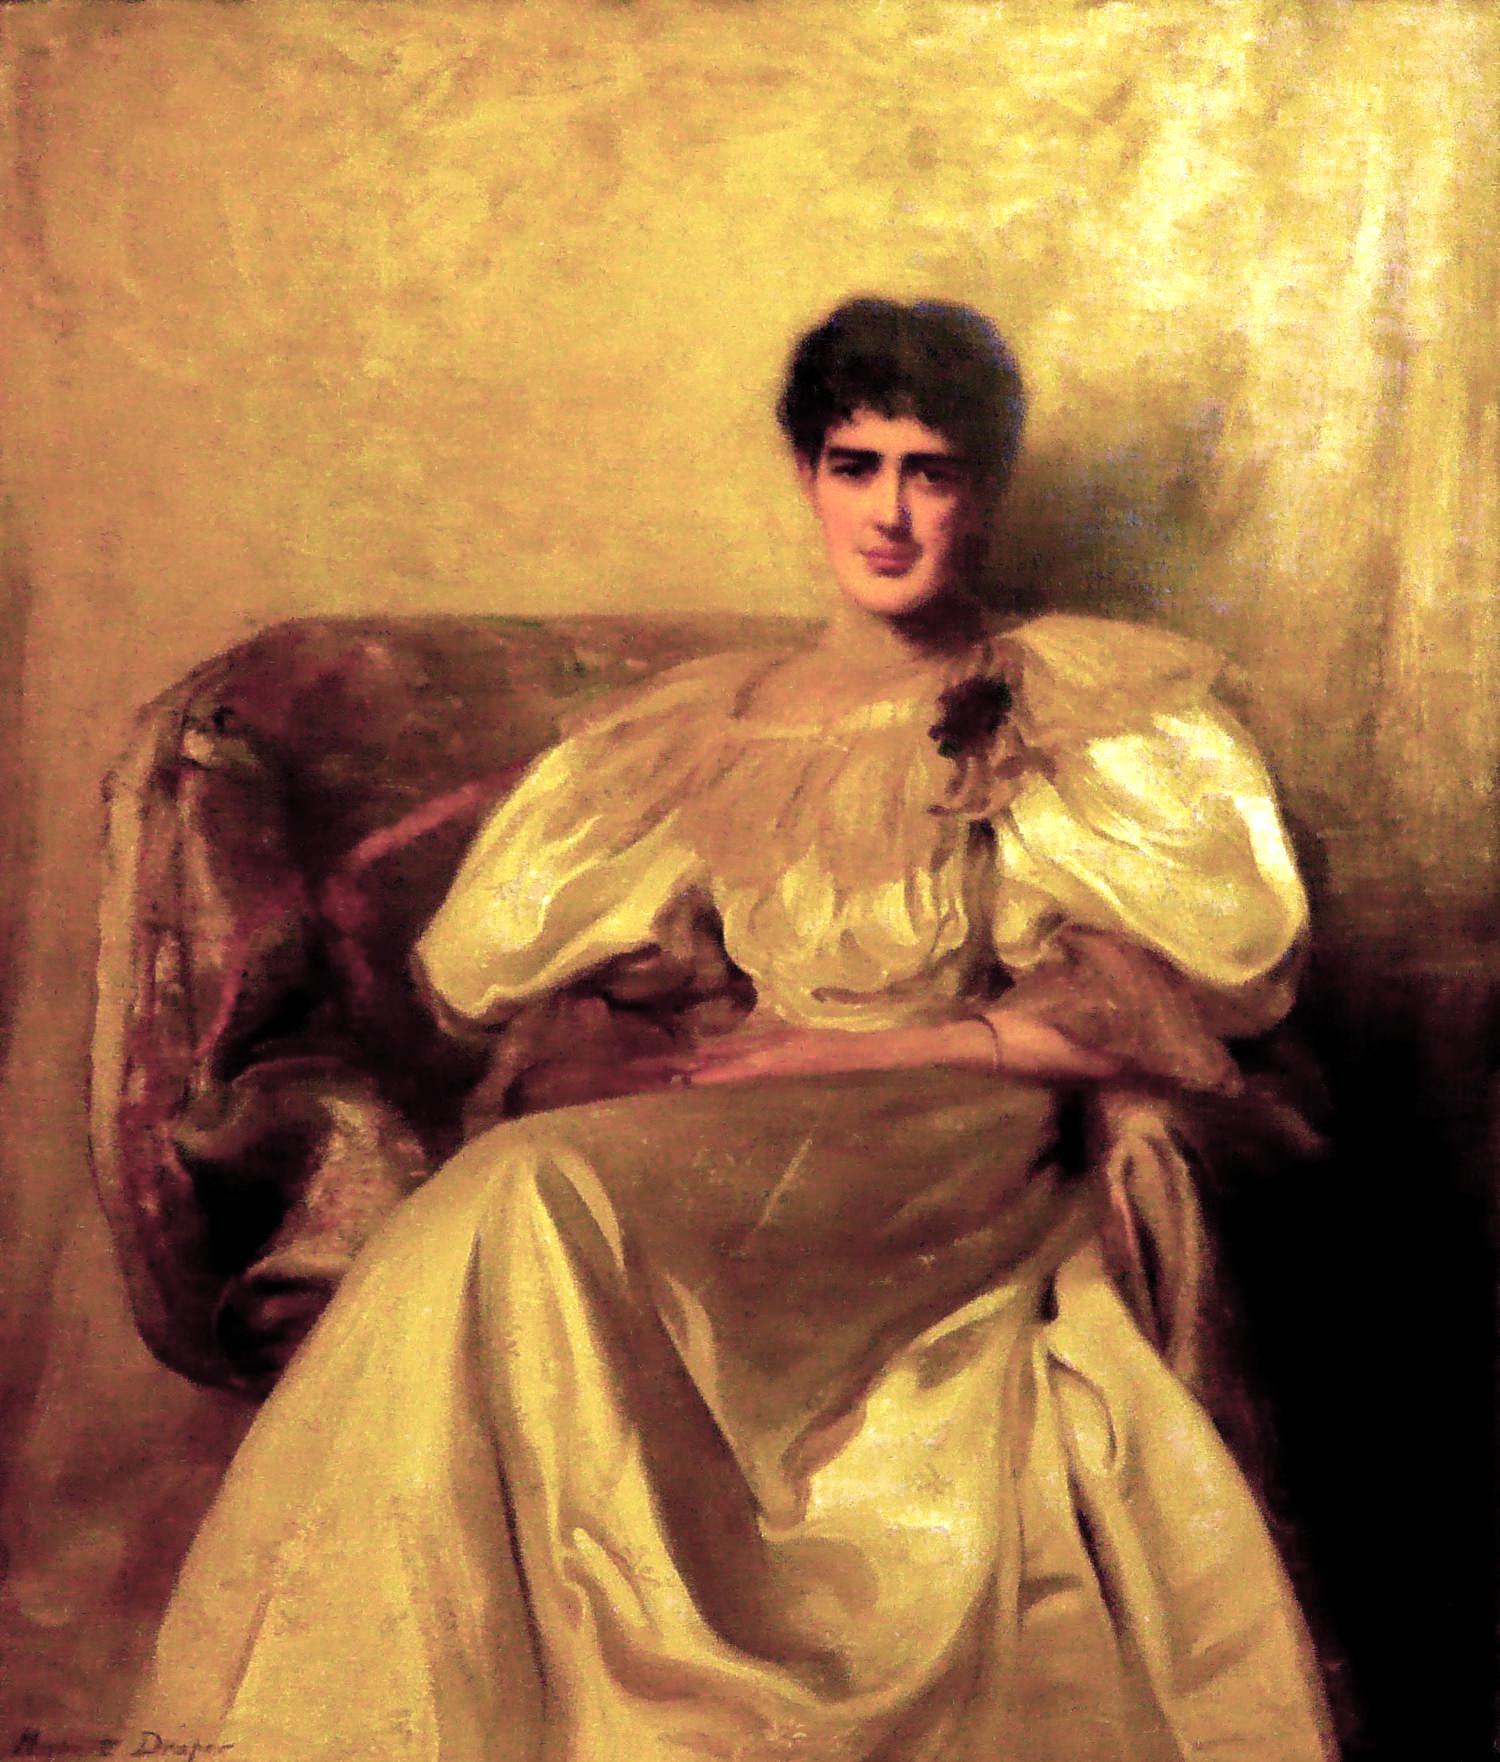 Herbert_James_Draper,_Portrait_of_Ida_Draper